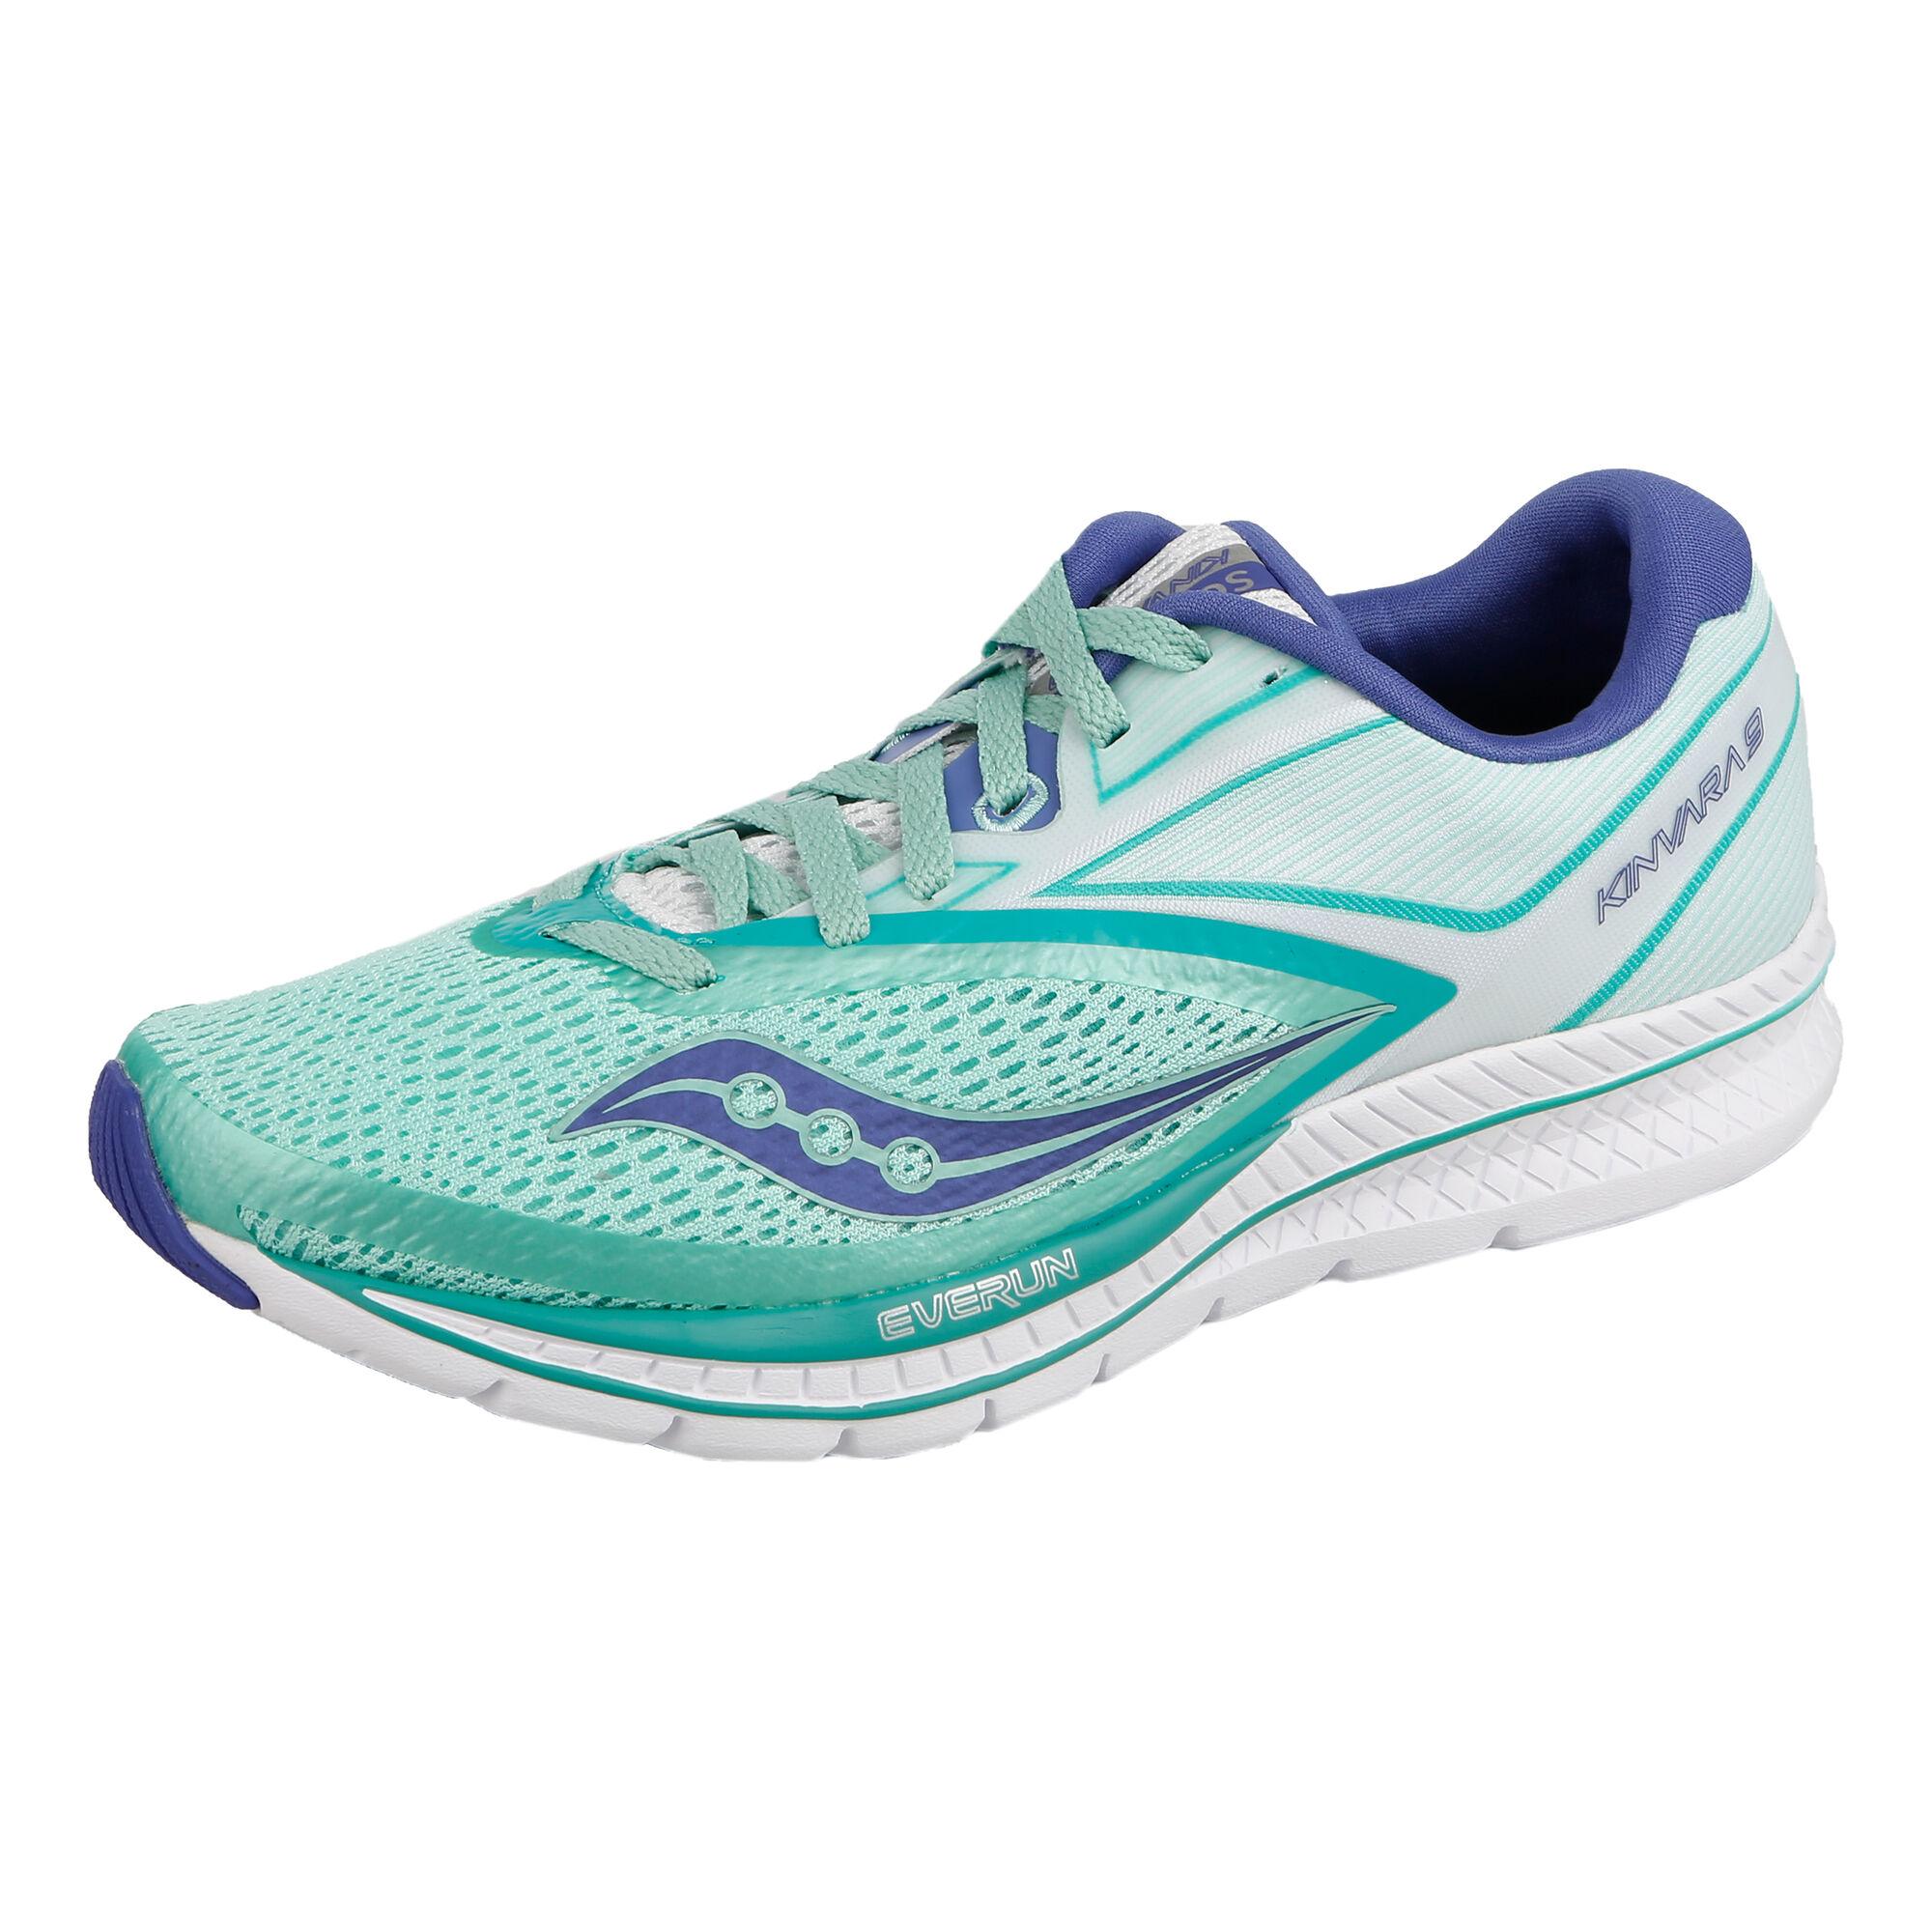 buy online 38187 2b65a Saucony Kinvara 9 Neutral Running Shoe Women - Mint, White